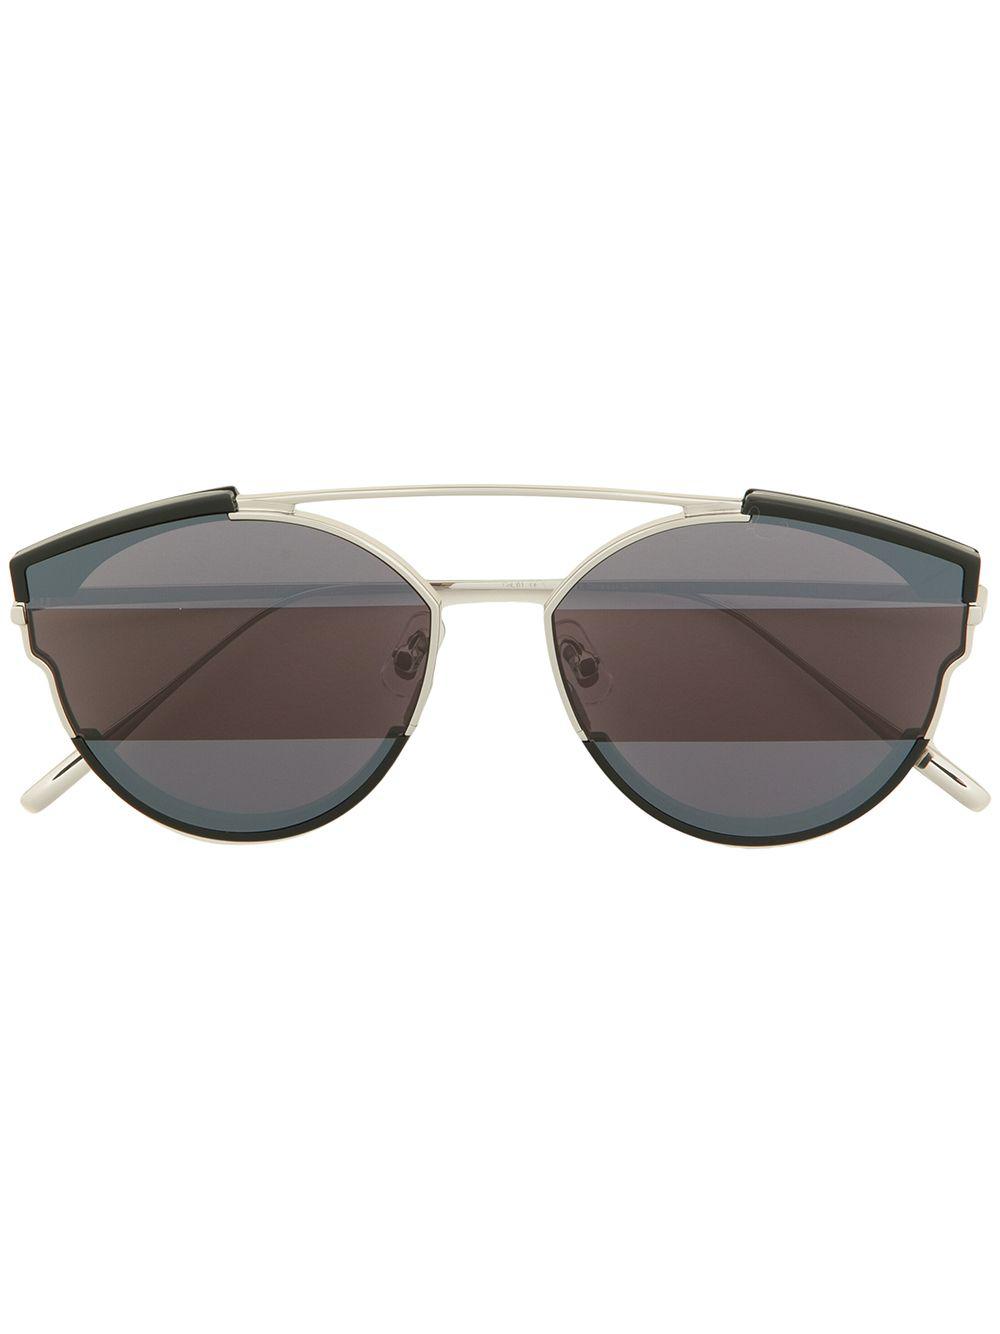 b162cd648efe8 Gentle Monster Cee Cee 01 Sunglasses - Black